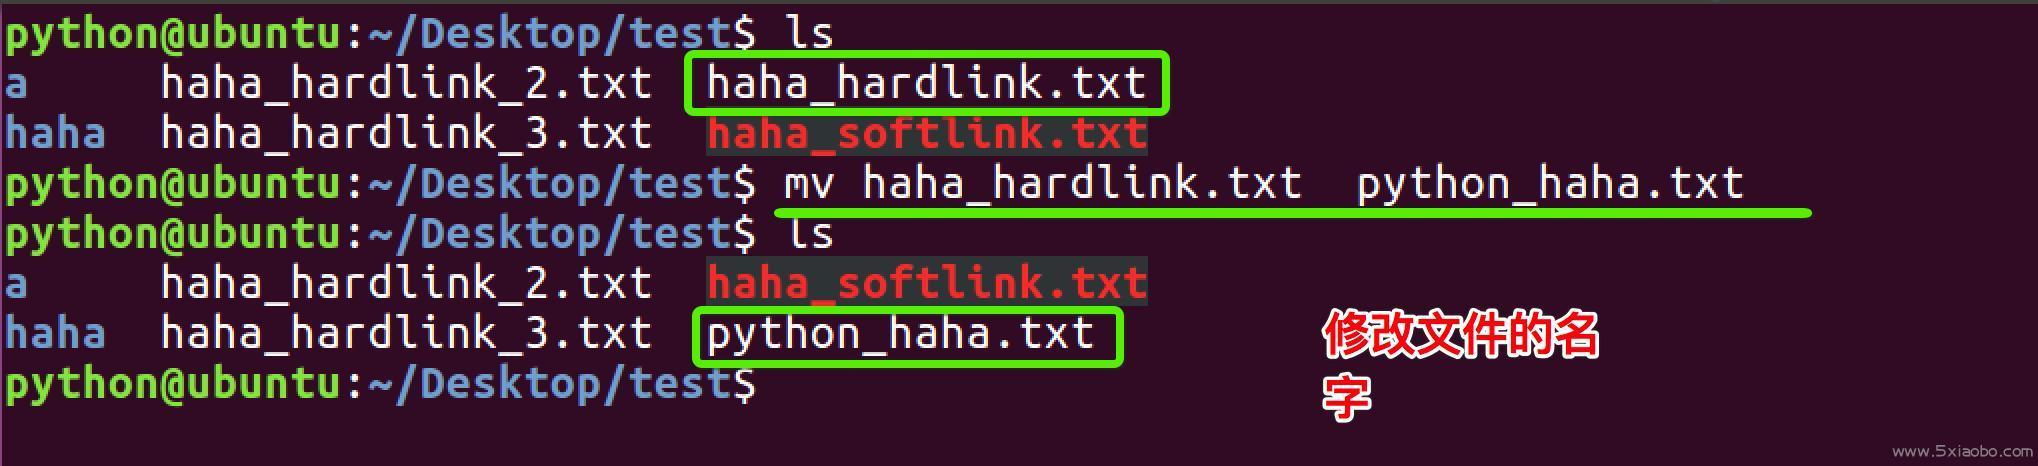 认识Linux命令--文件、磁盘管理  Linux 命令 第27张